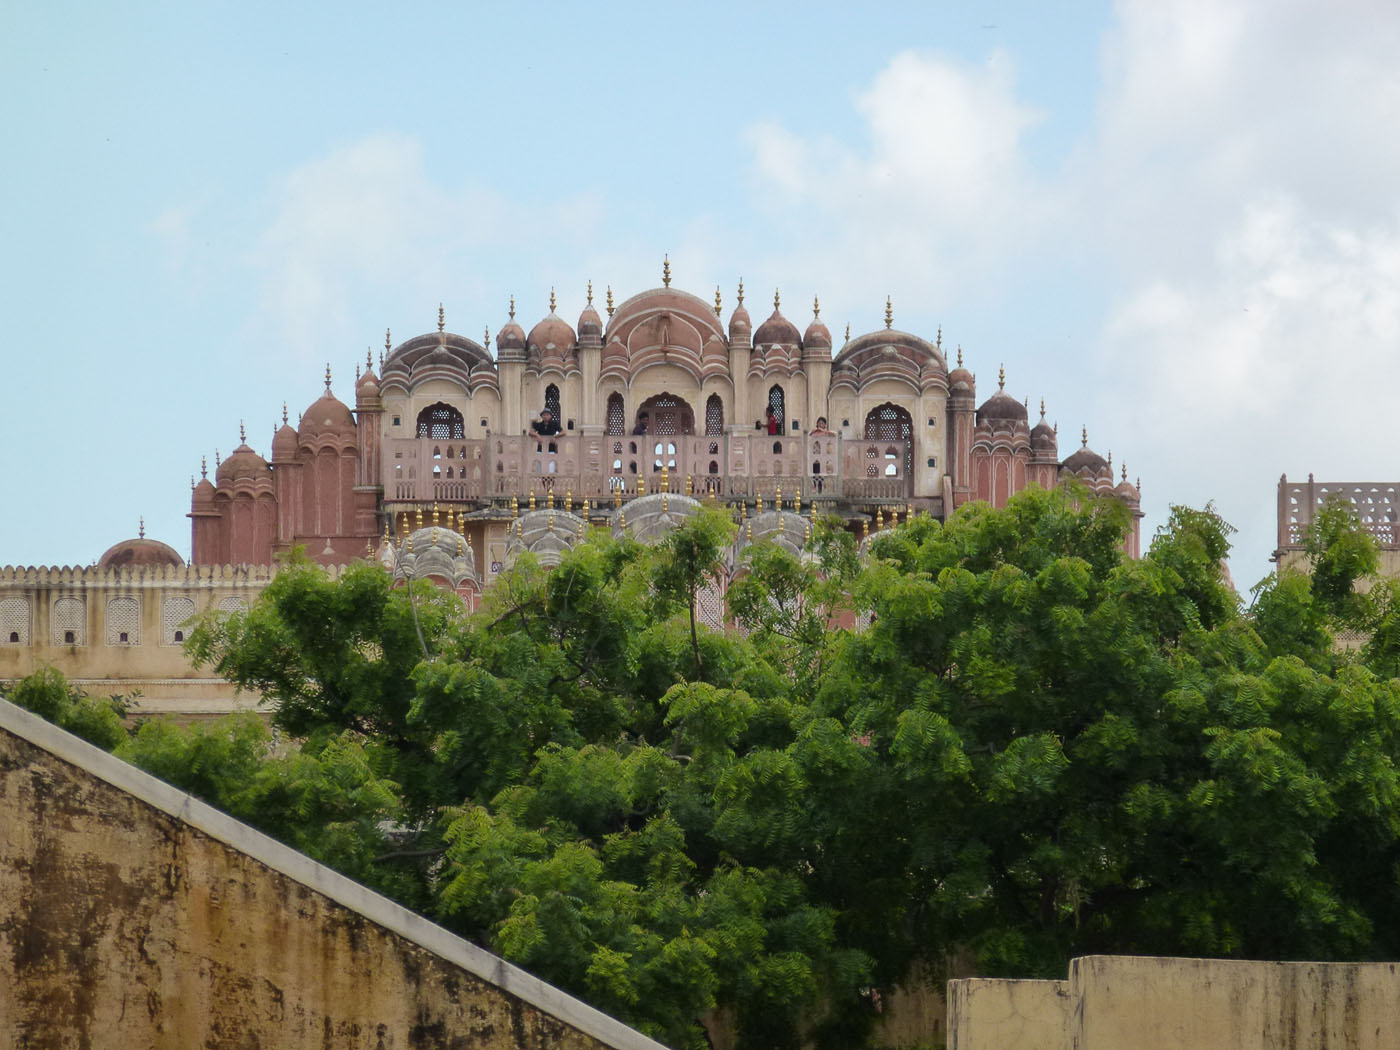 Фото 6. Вид на обсерваторию Джантар-Мантар в Джайпуре. Золотой треугольник Индии